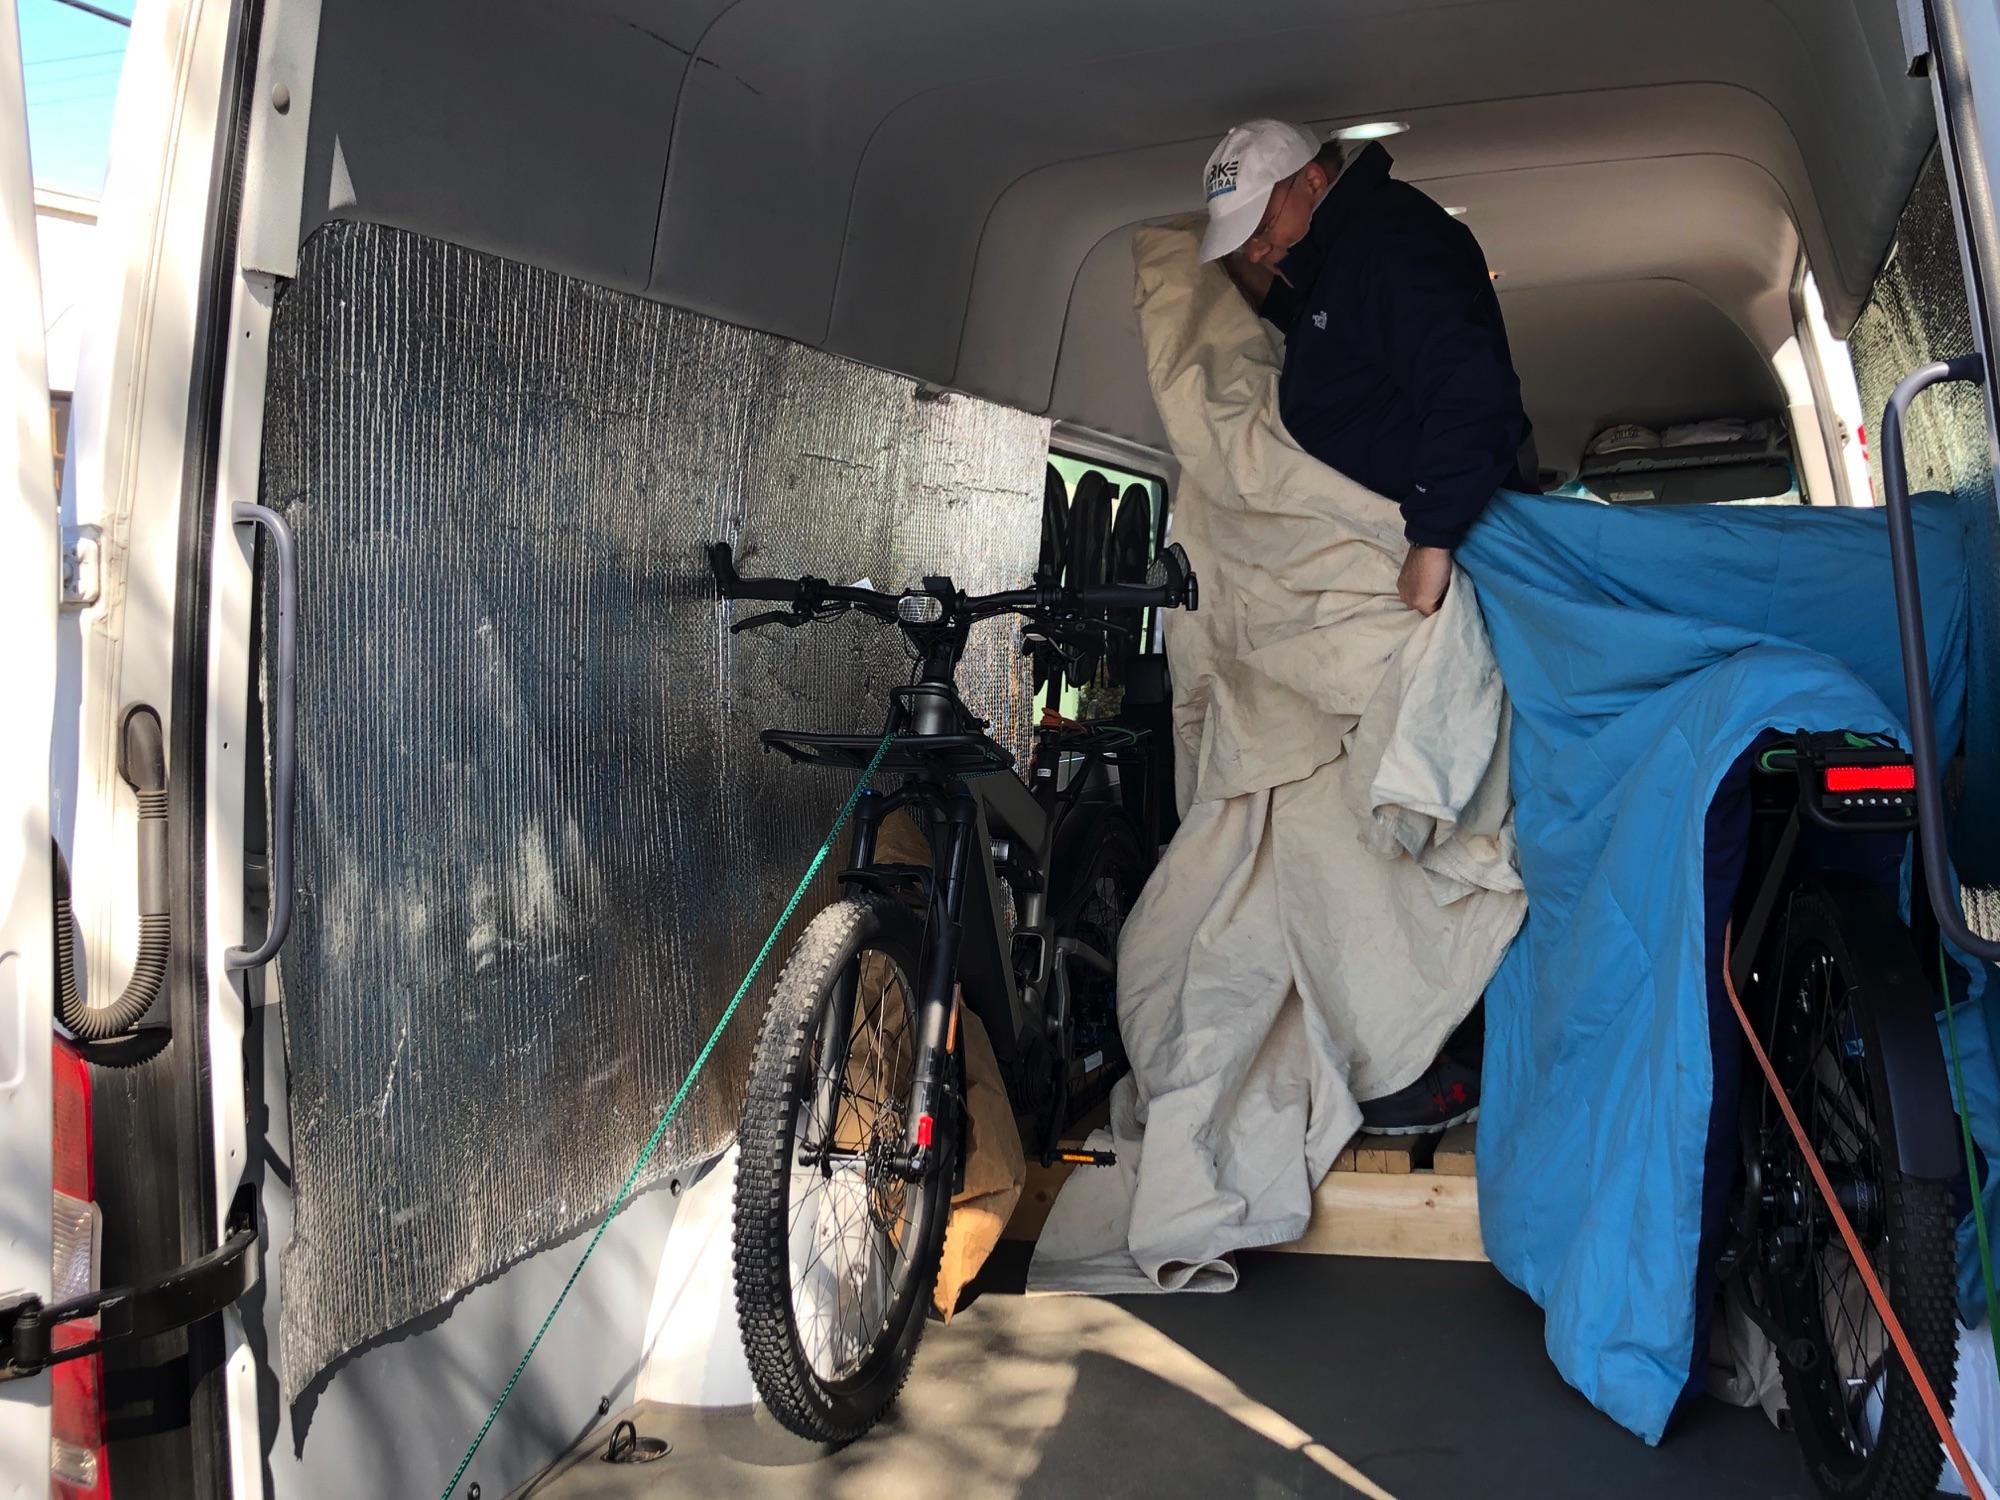 Loading Deliveries in eBike Central Van in Greensboro NC